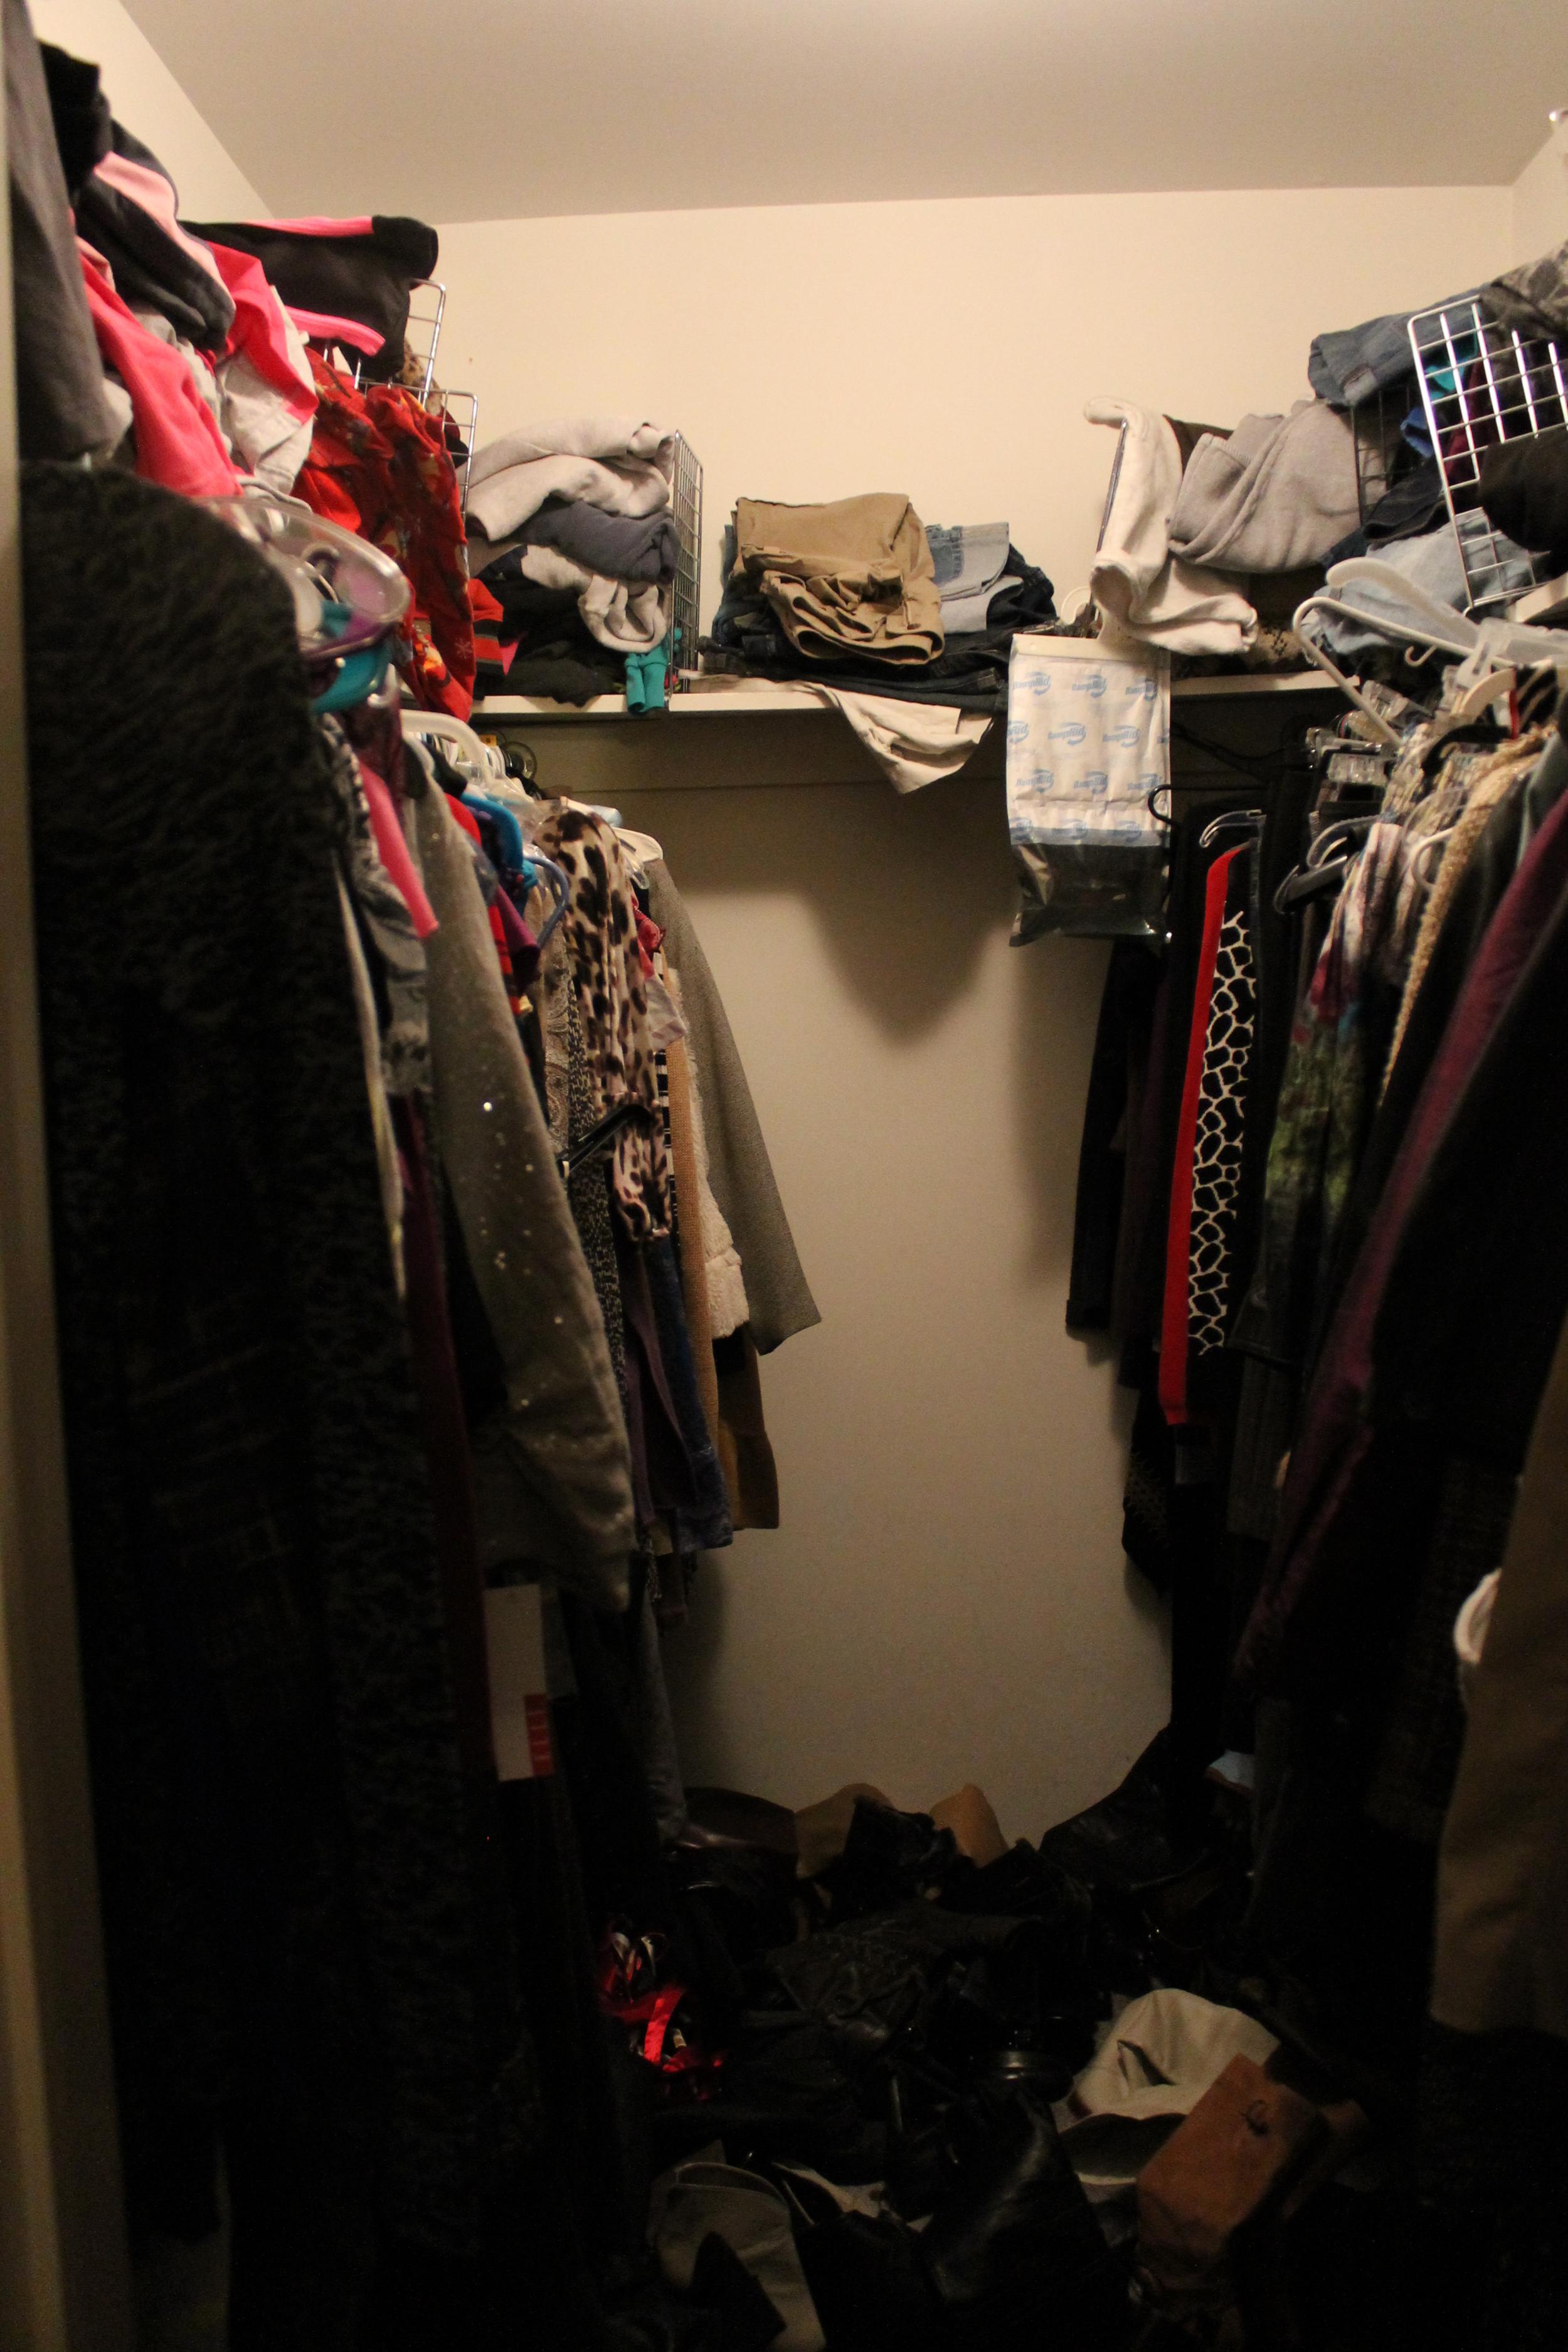 Master Bedroom Closet: Before